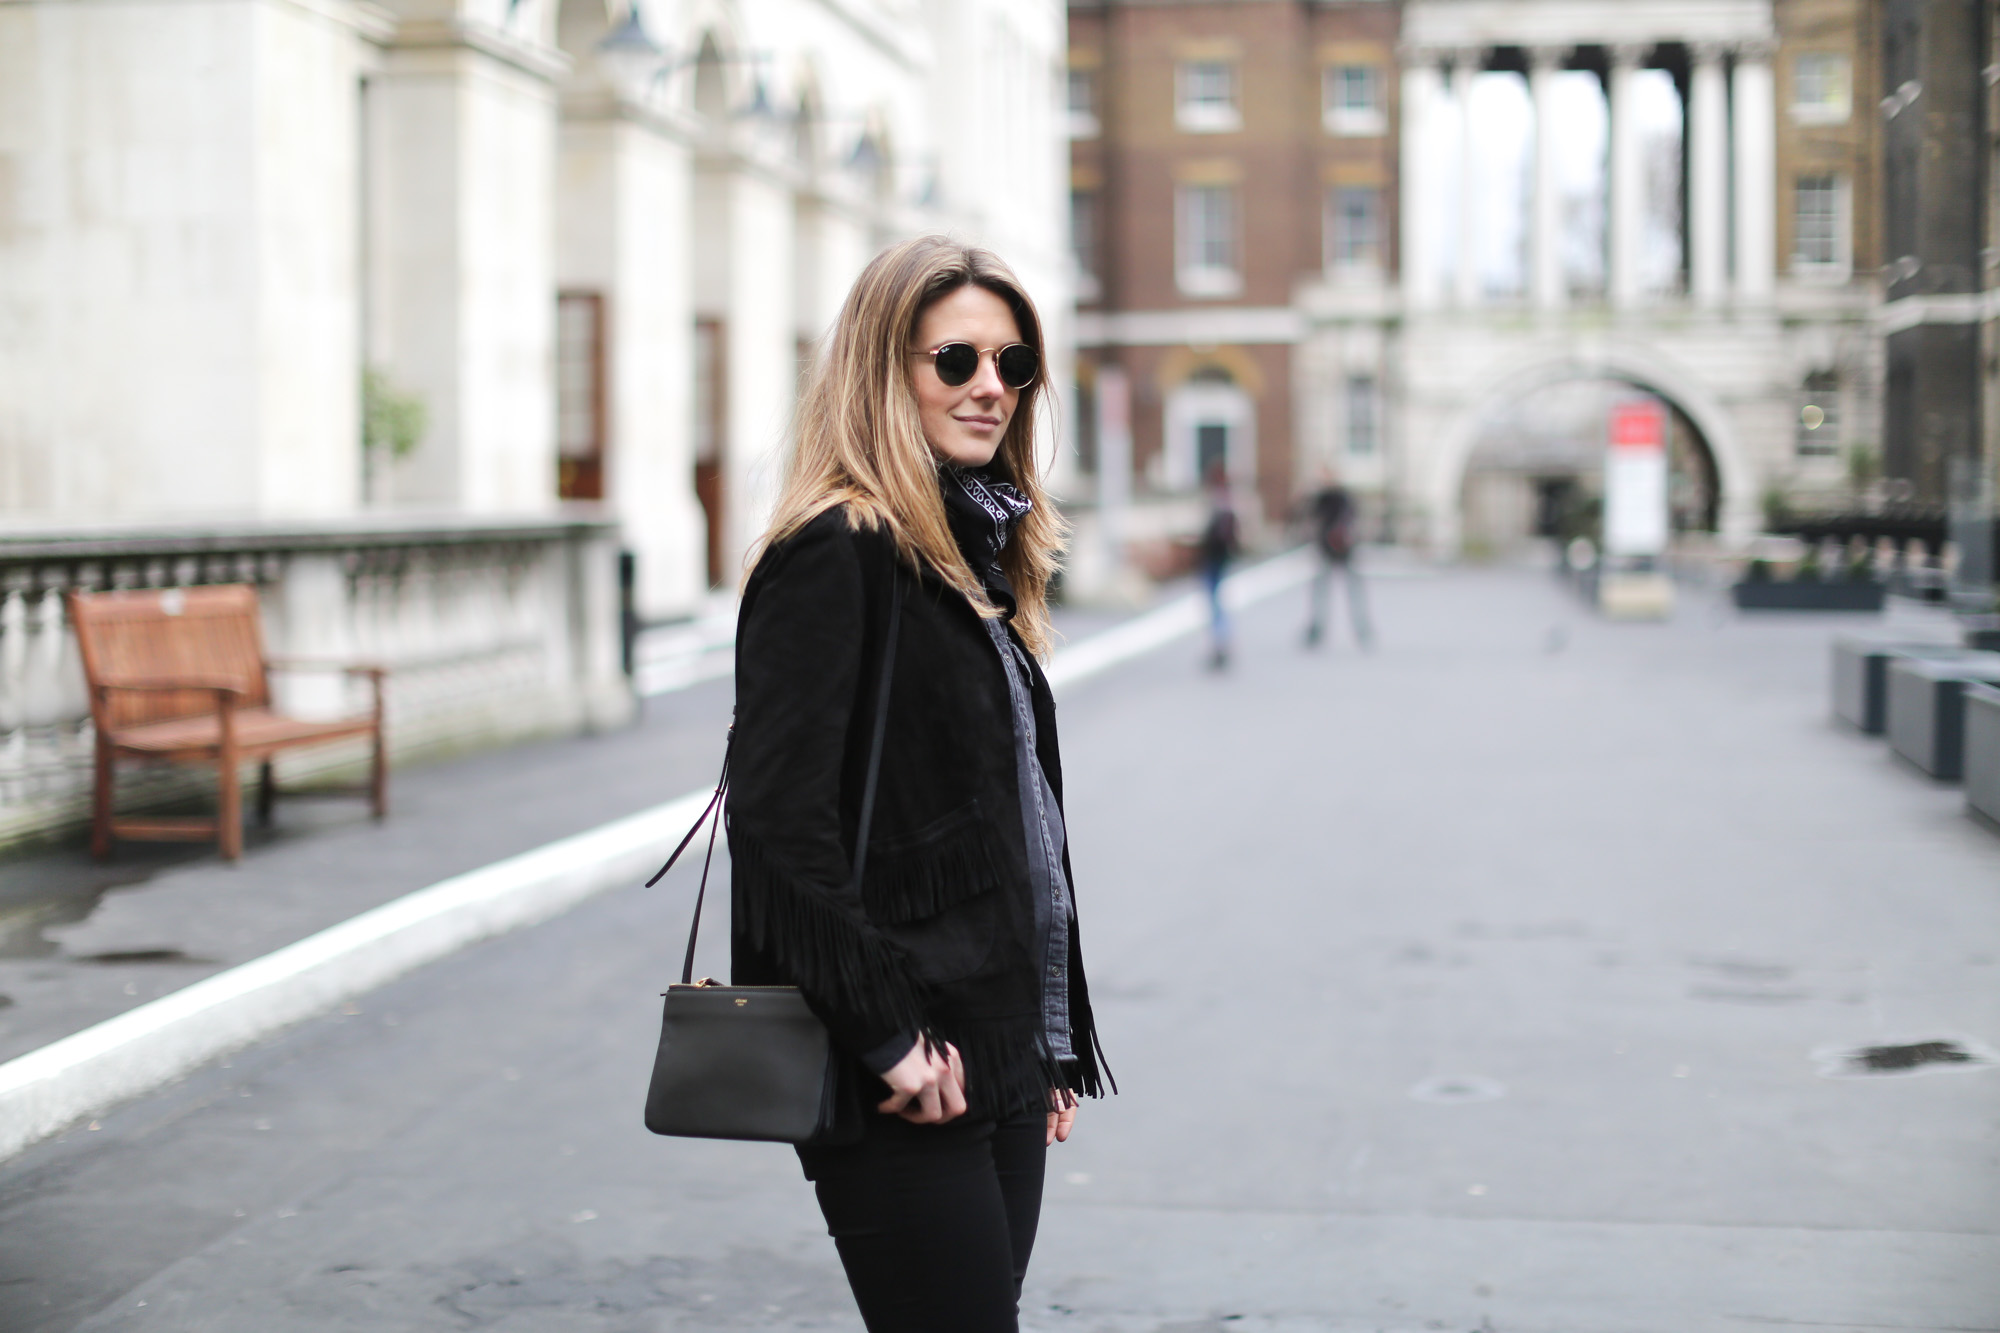 Clochet-streetstyle-lfw-london-fashion-week-maje-fringed-suede-jacket-cowboy-boots-6